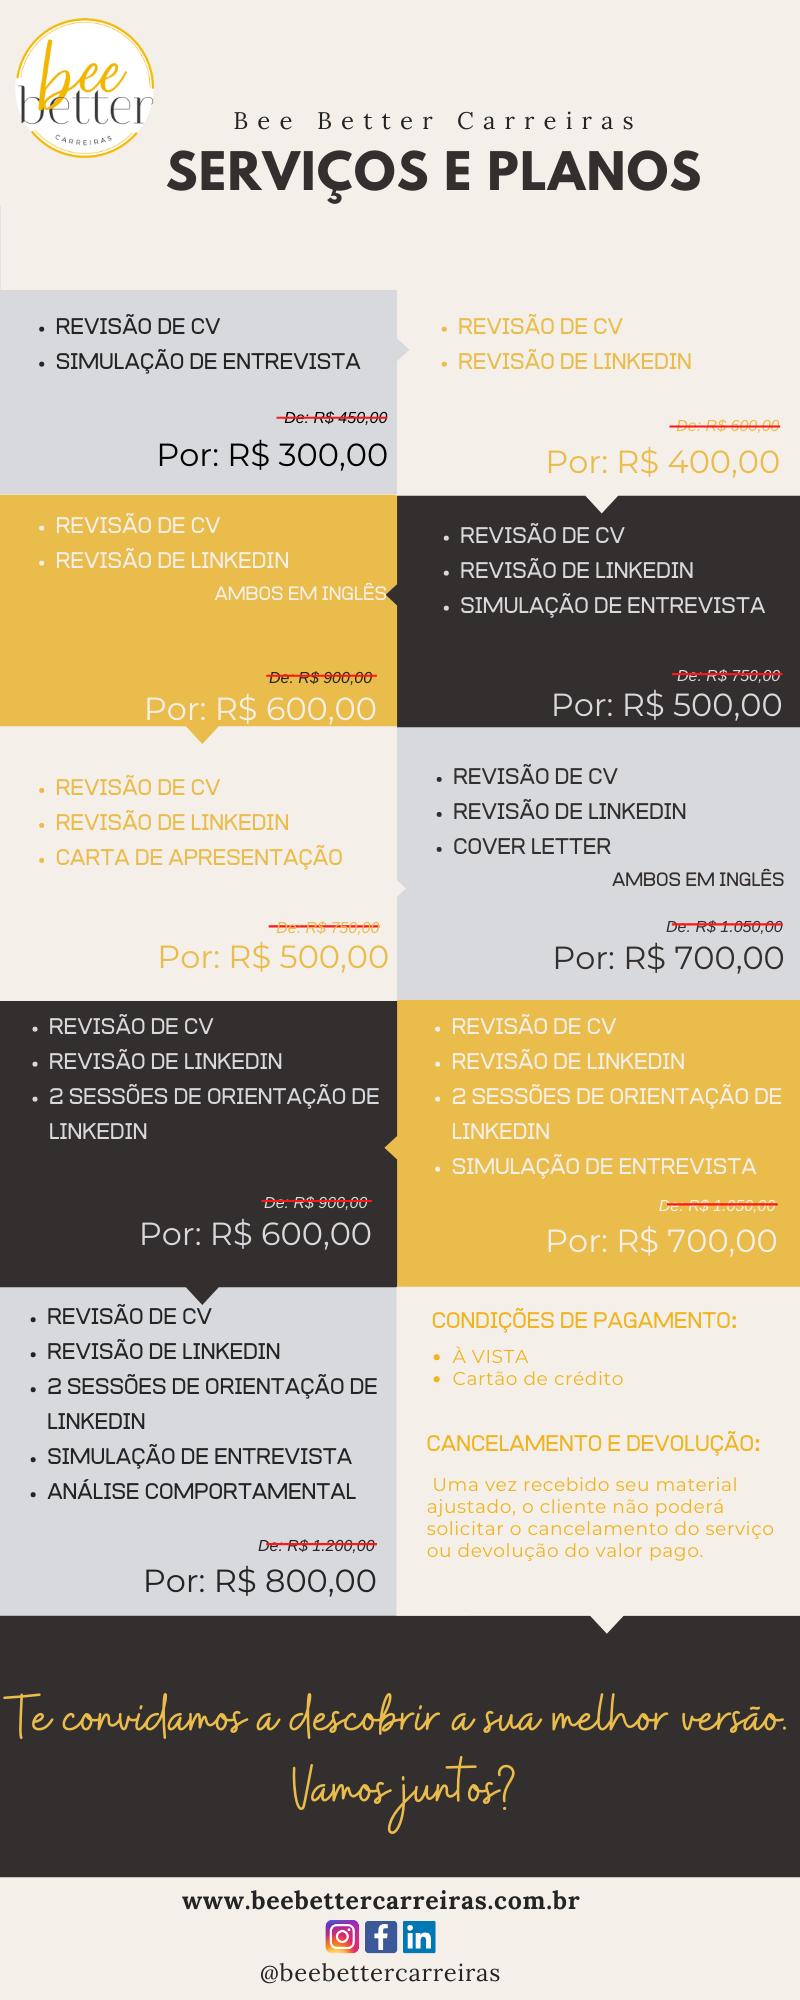 Bee_Better_Carreiras_-_Serviços_e_Plano